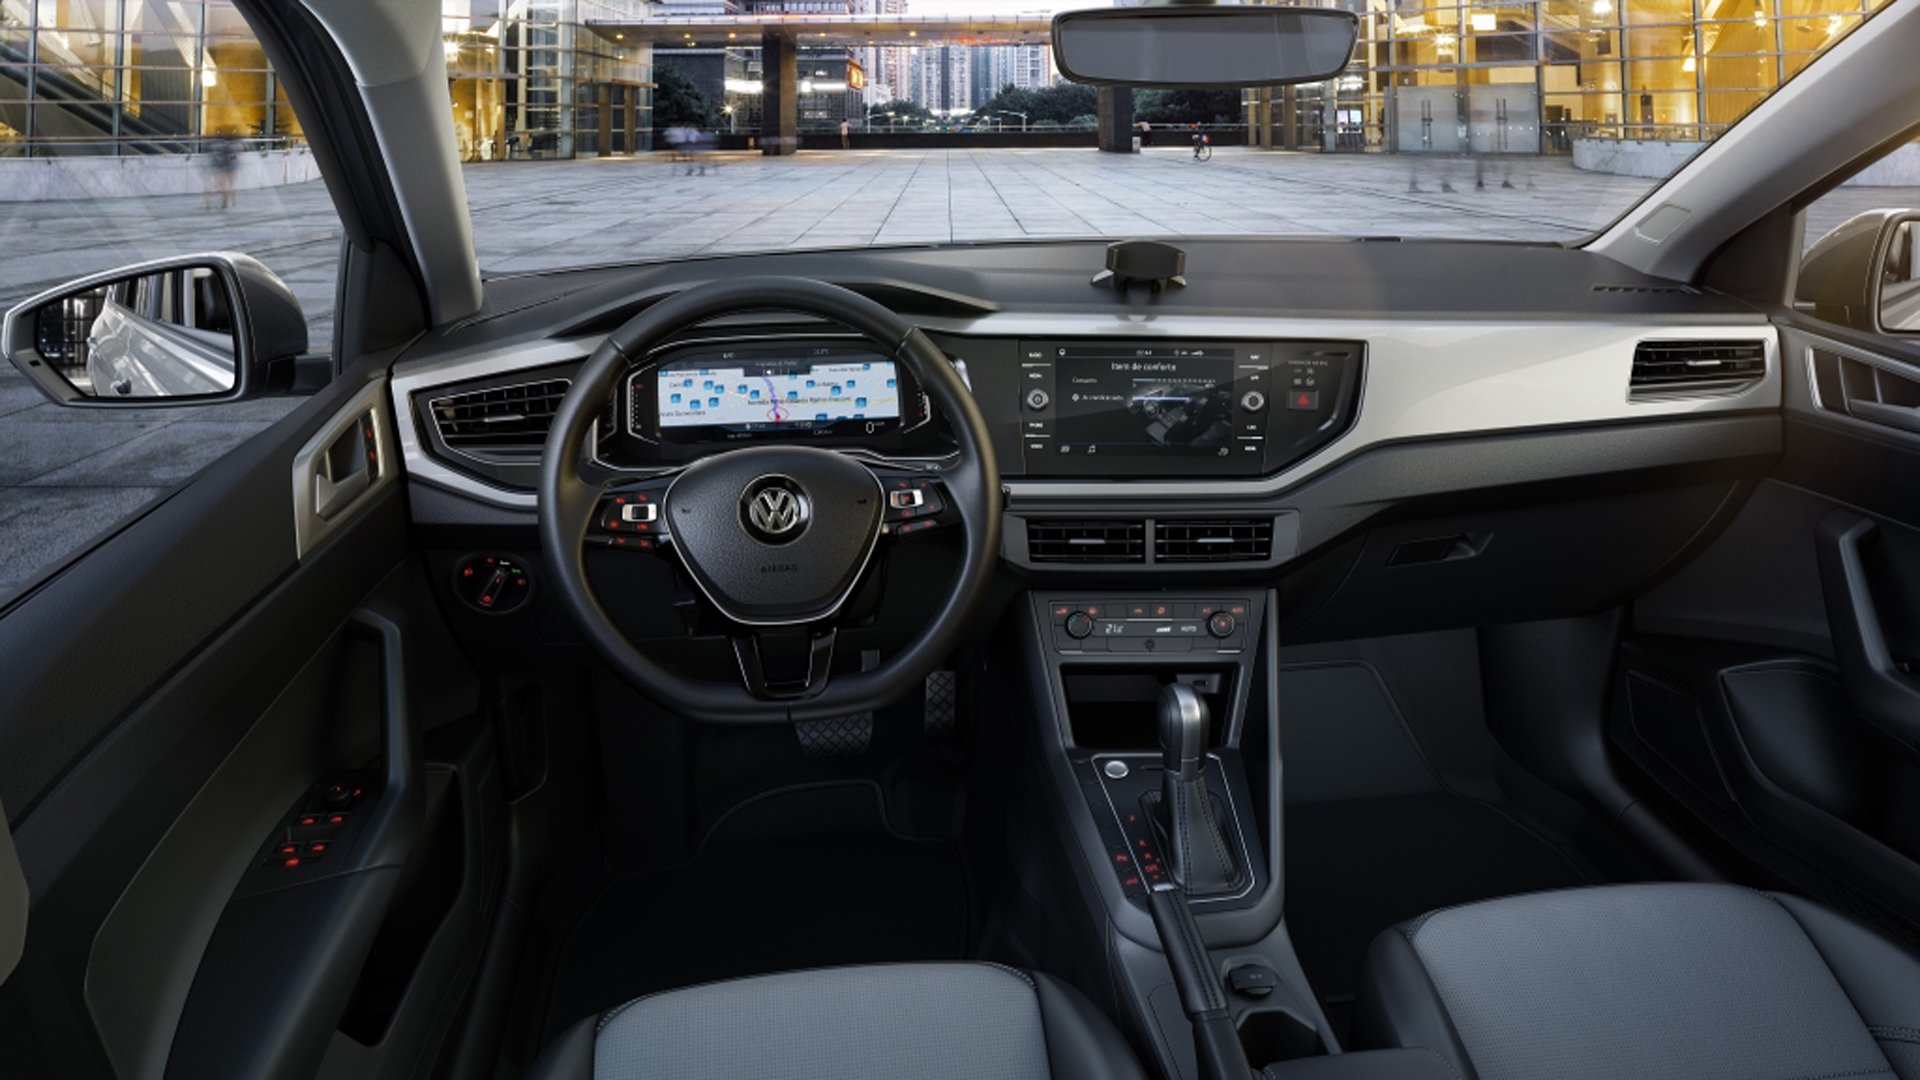 Volkswagen Virtus / Polo 2019